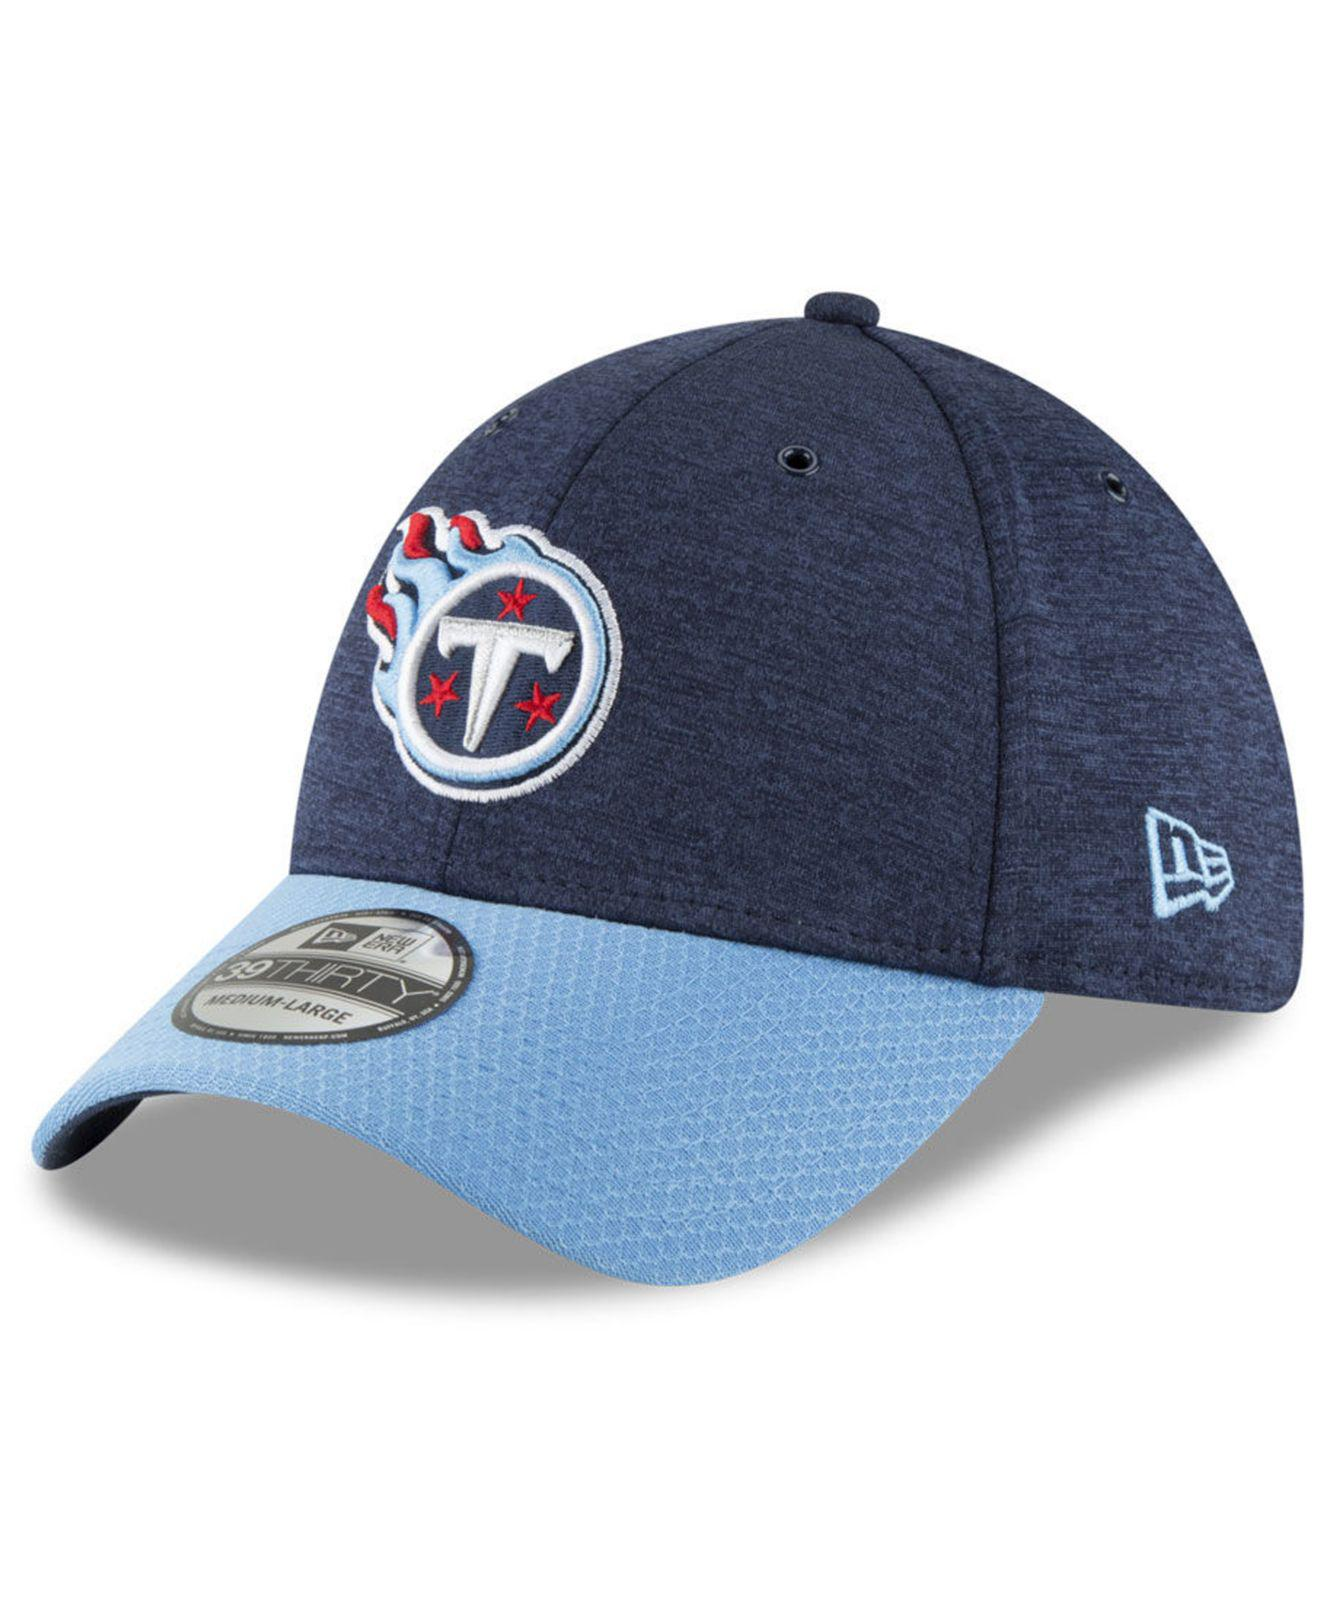 best service 60e10 ccfbc KTZ. Men s Blue Tennessee Titans On Field Sideline Home 39thirty Cap